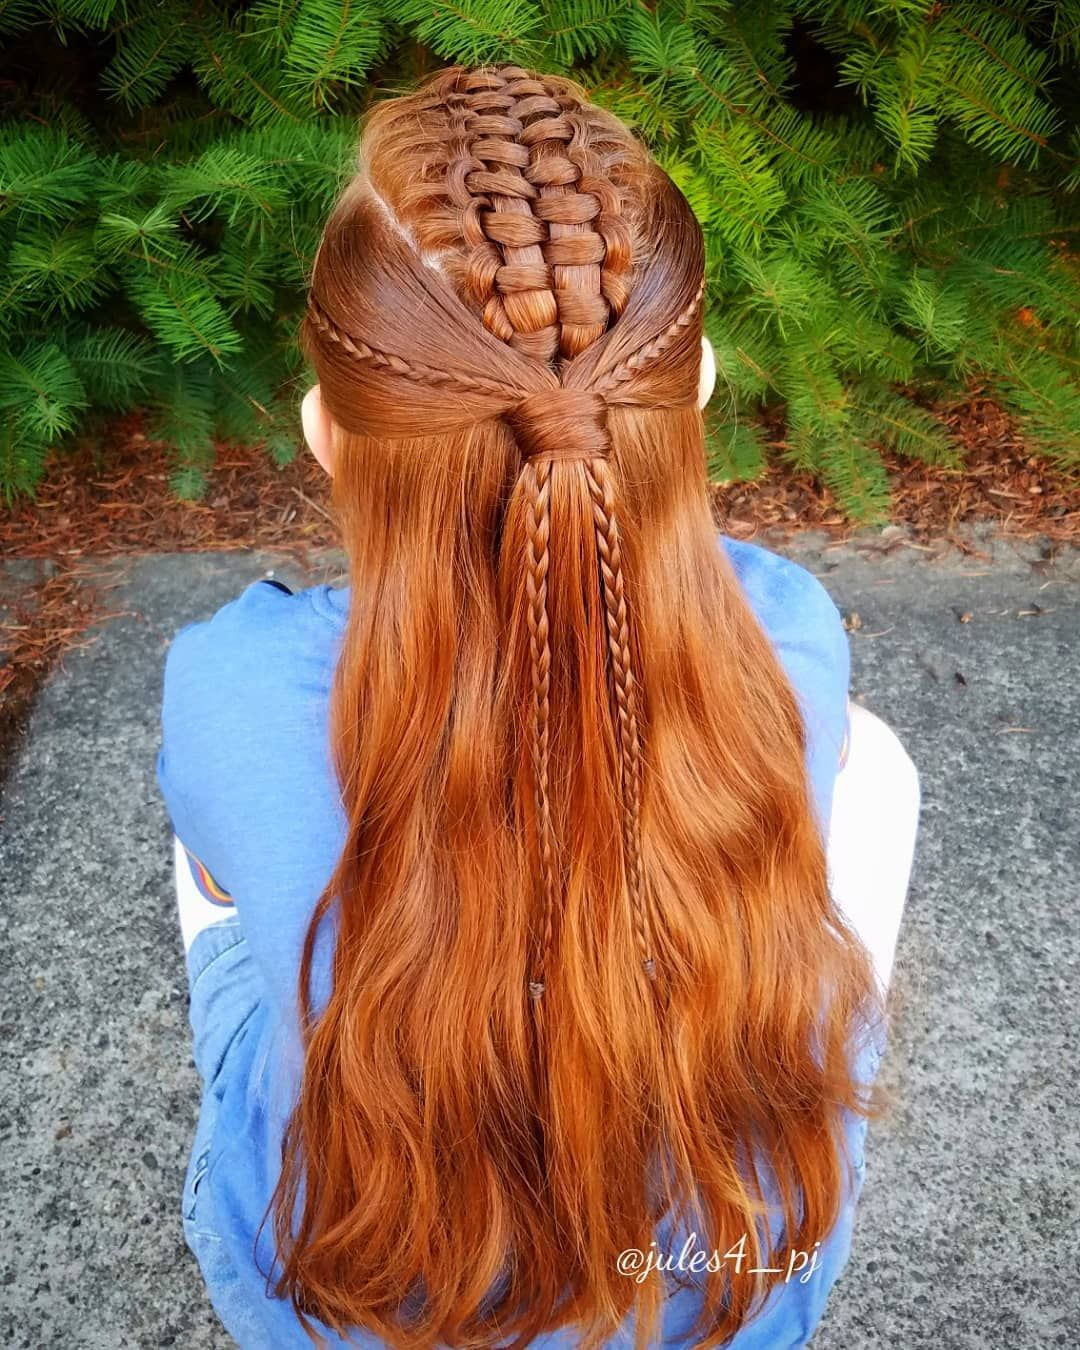 Zipperbraid Accent Braids Halfup Hairstyles Braid Combos School Hair Braids For Kids Cute Girl Hai Redhead Hairstyles Hair Styles Kids Braided Hairstyles